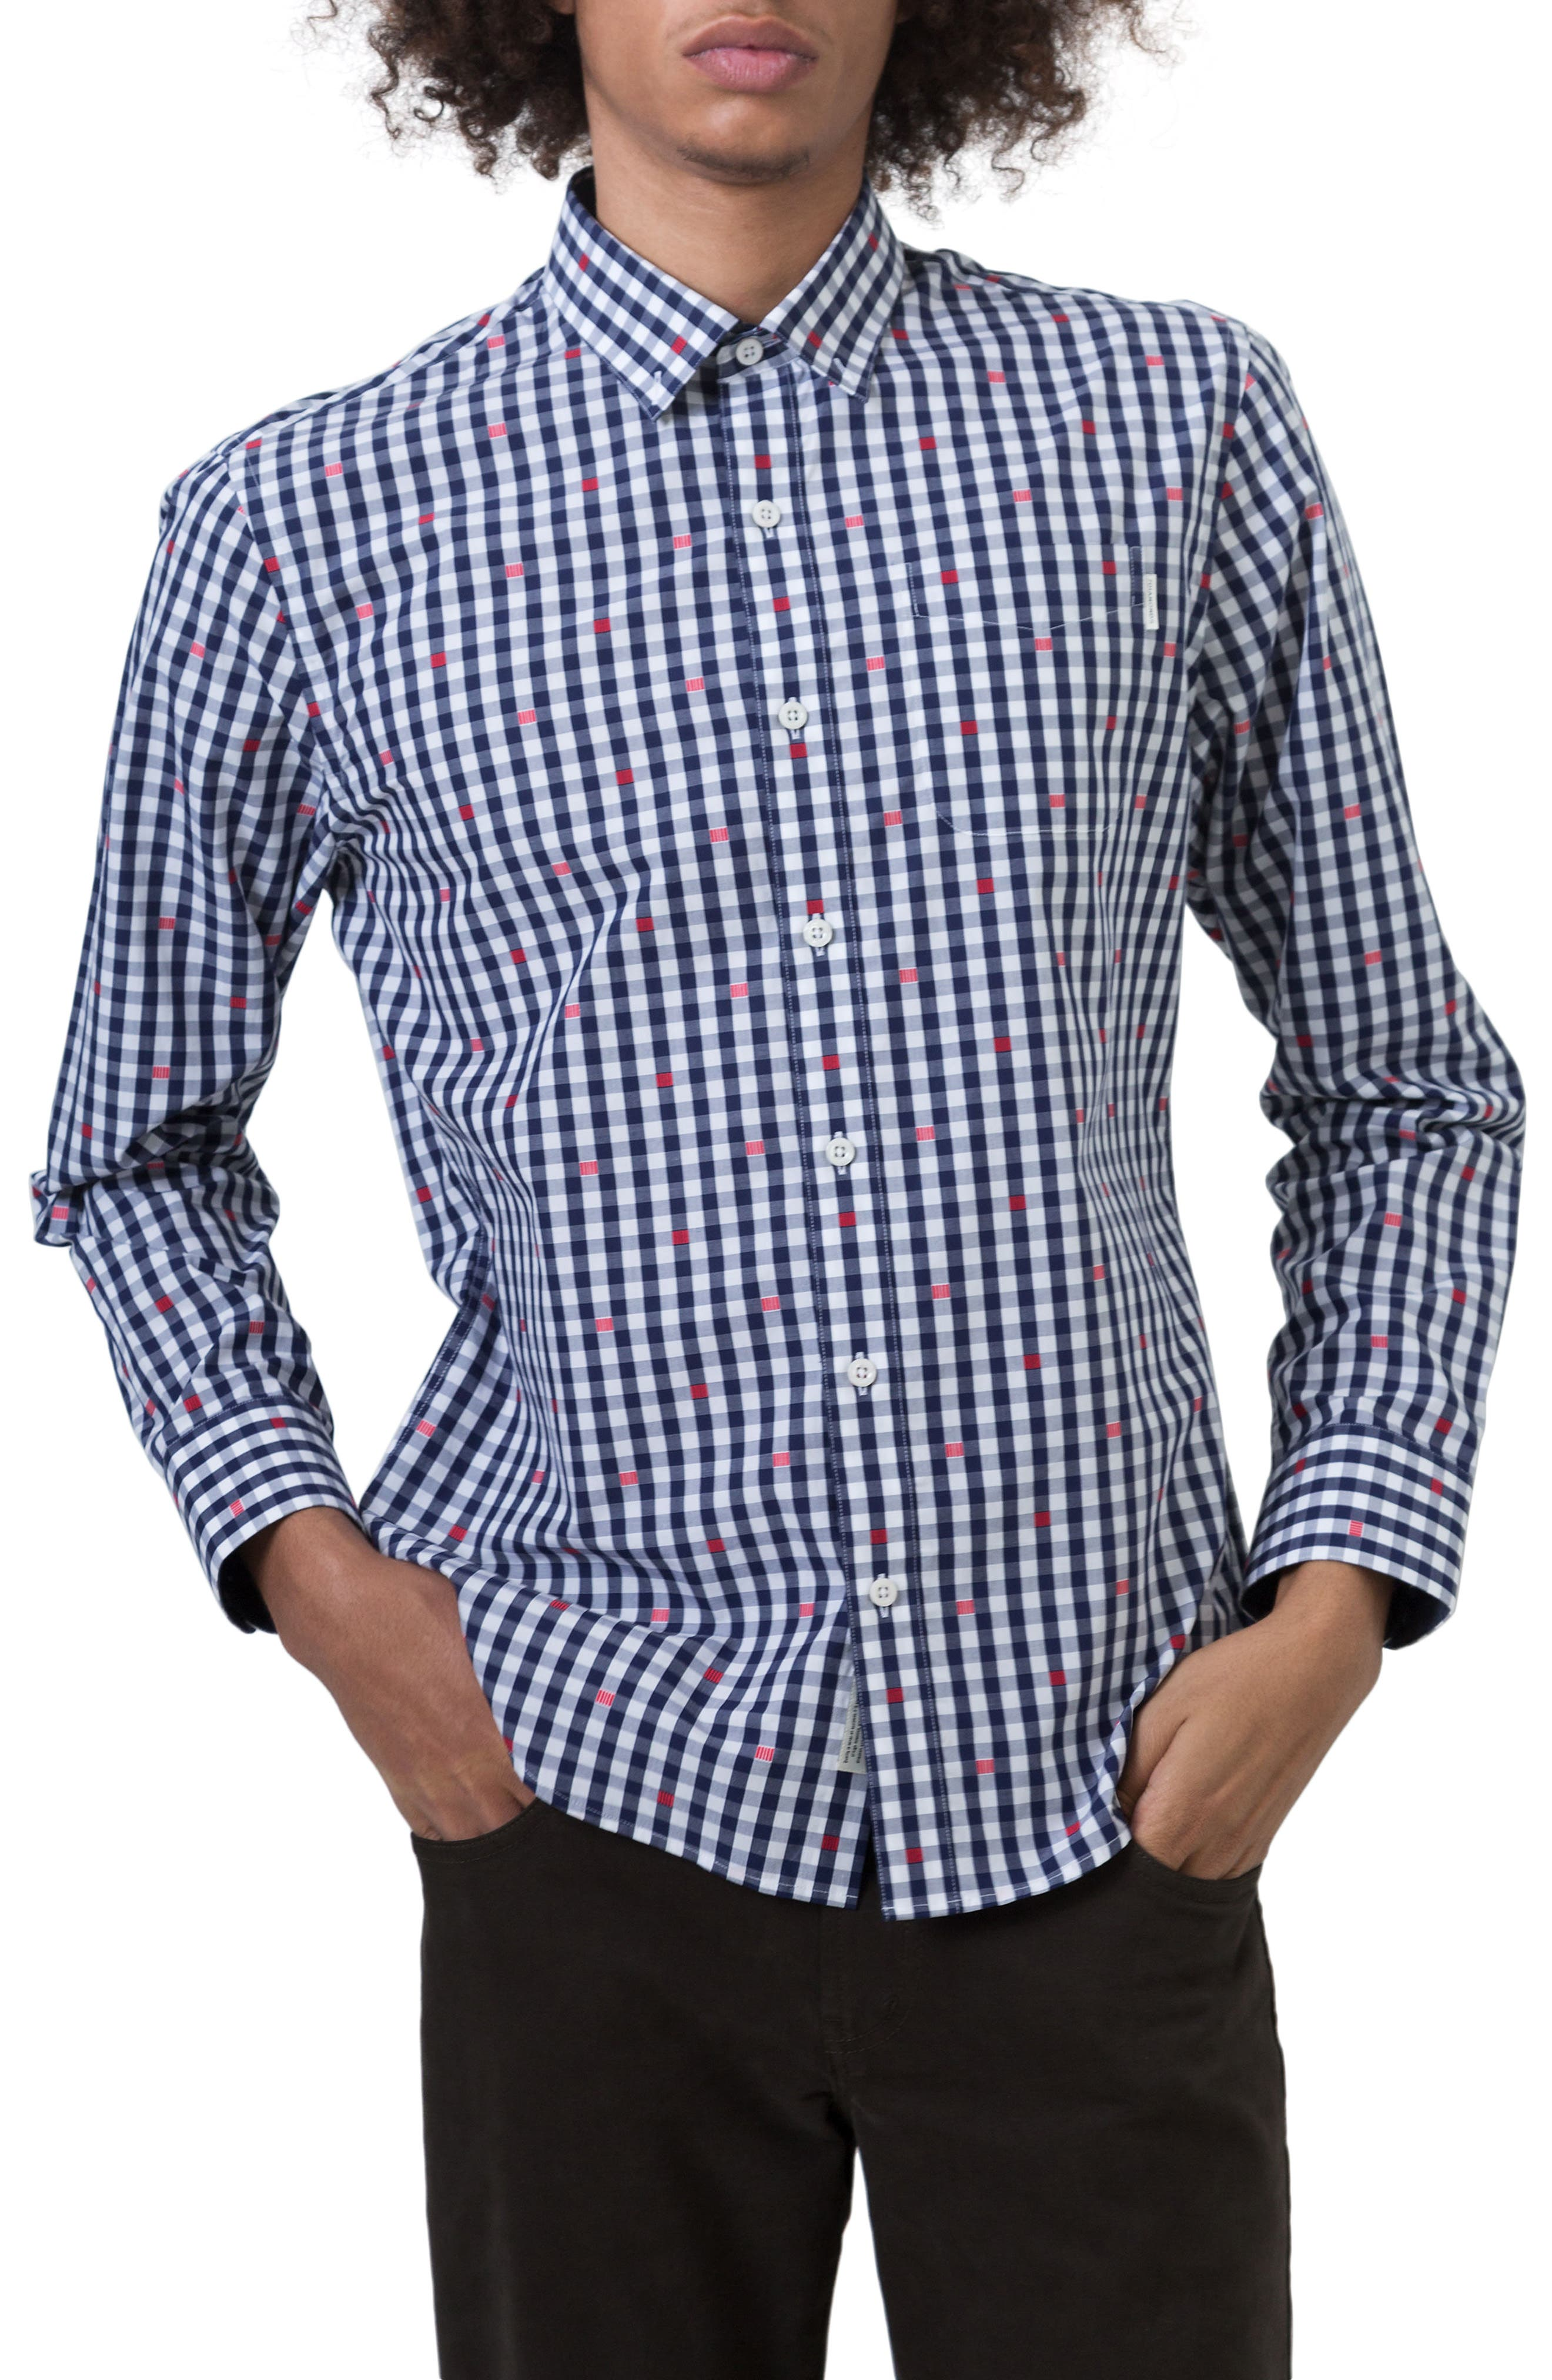 Petrichor Woven Shirt,                         Main,                         color, 410